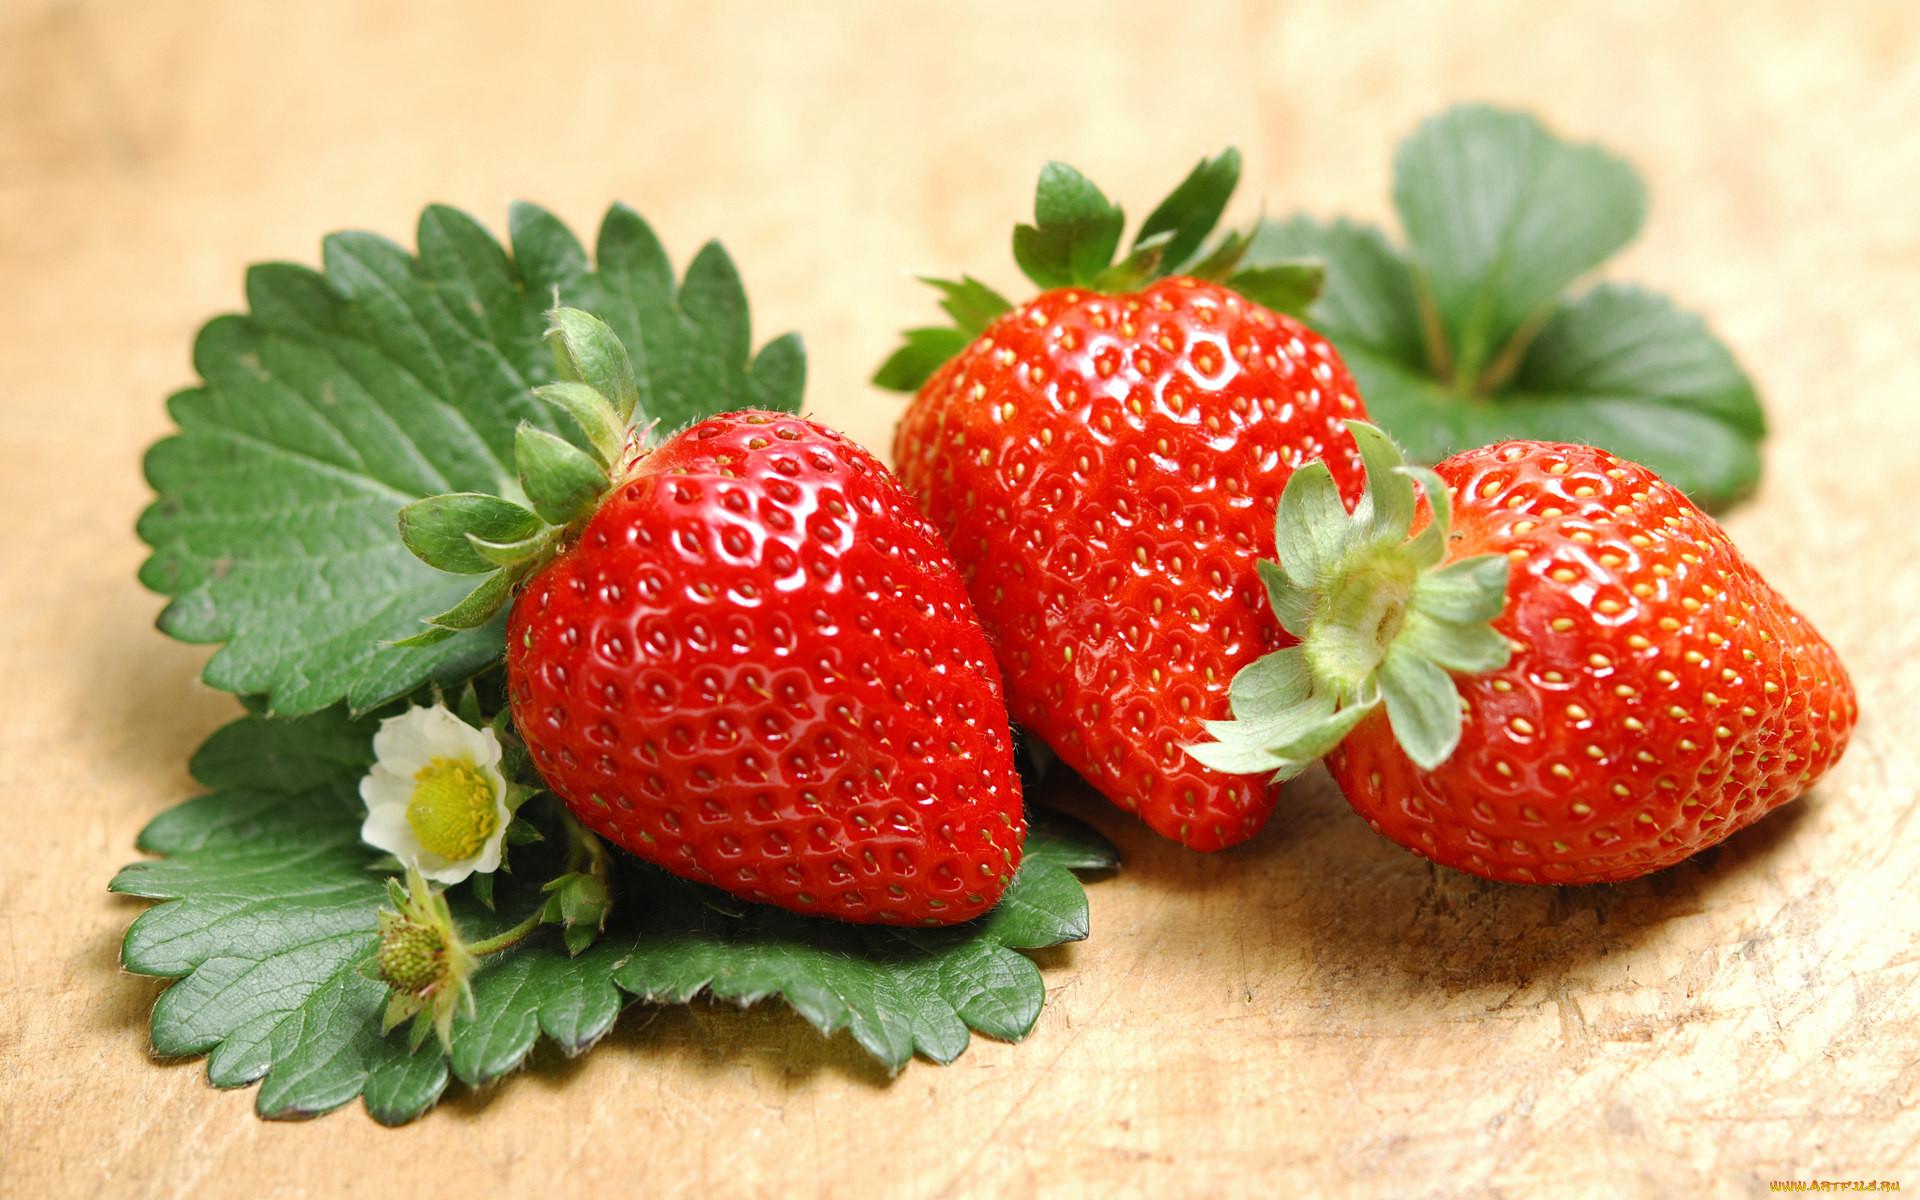 картинки ягода виктория обычаи обряды